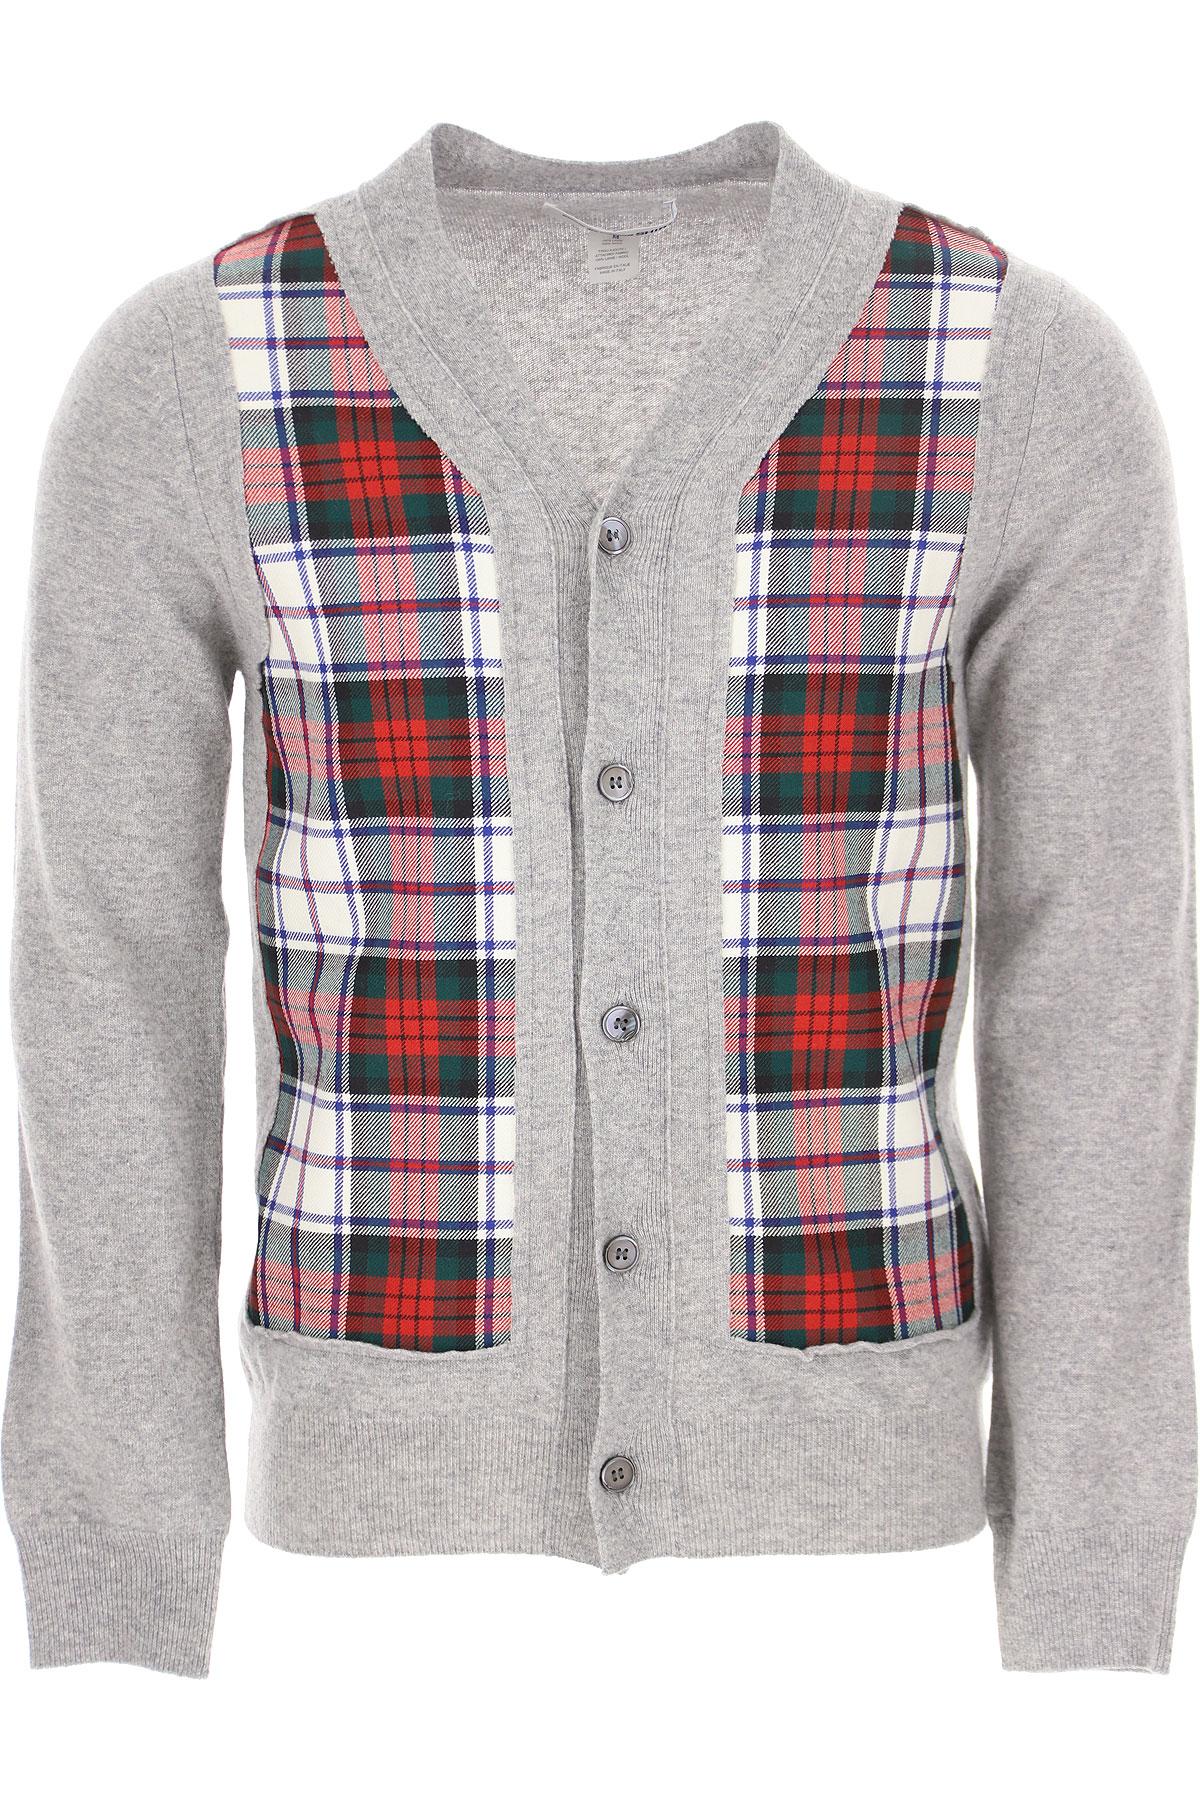 Comme des Garcons Sweater for Men Jumper On Sale, Grey, Wool, 2019, L M